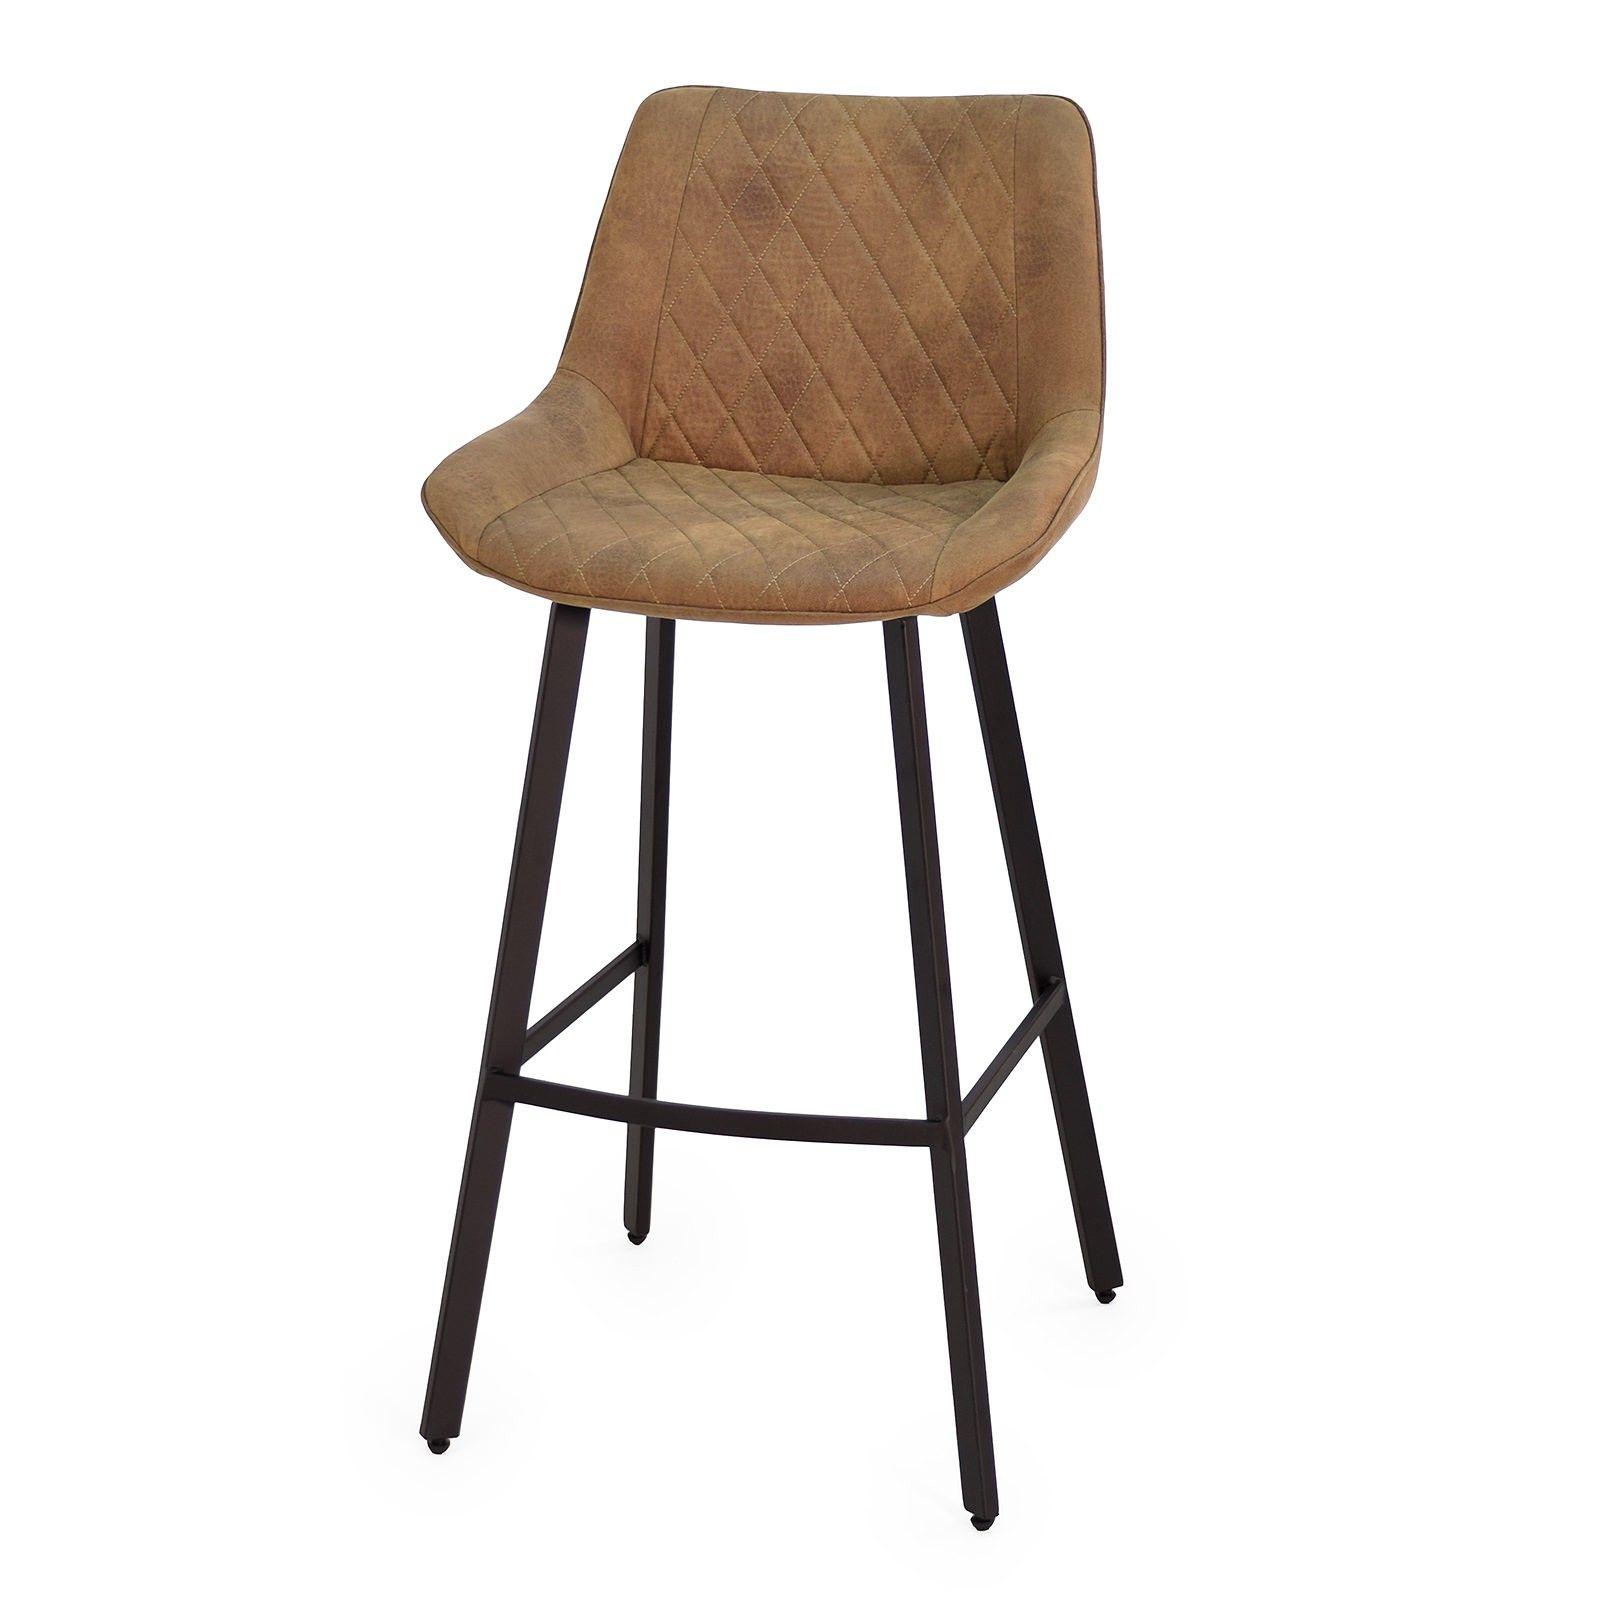 Barhocker Lederoptik Braun Metall Schwarz 2er Set Daru Ii Decor Home Decor Furniture